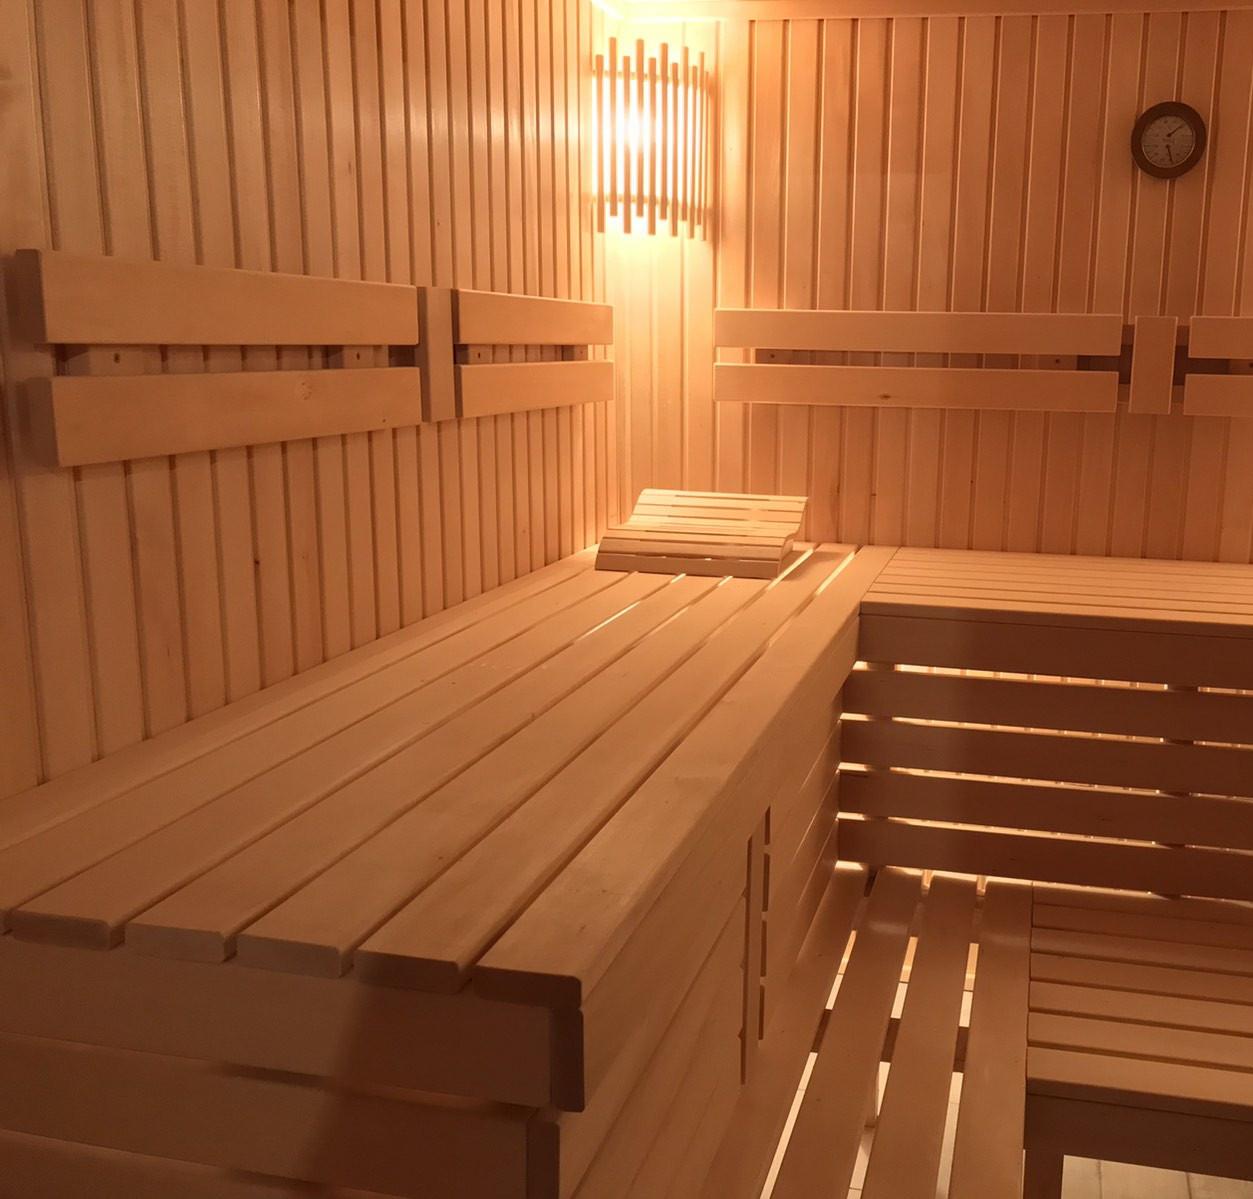 Сауна - баня под ключ  2500*3000мм с электрокаменкой и монтажом